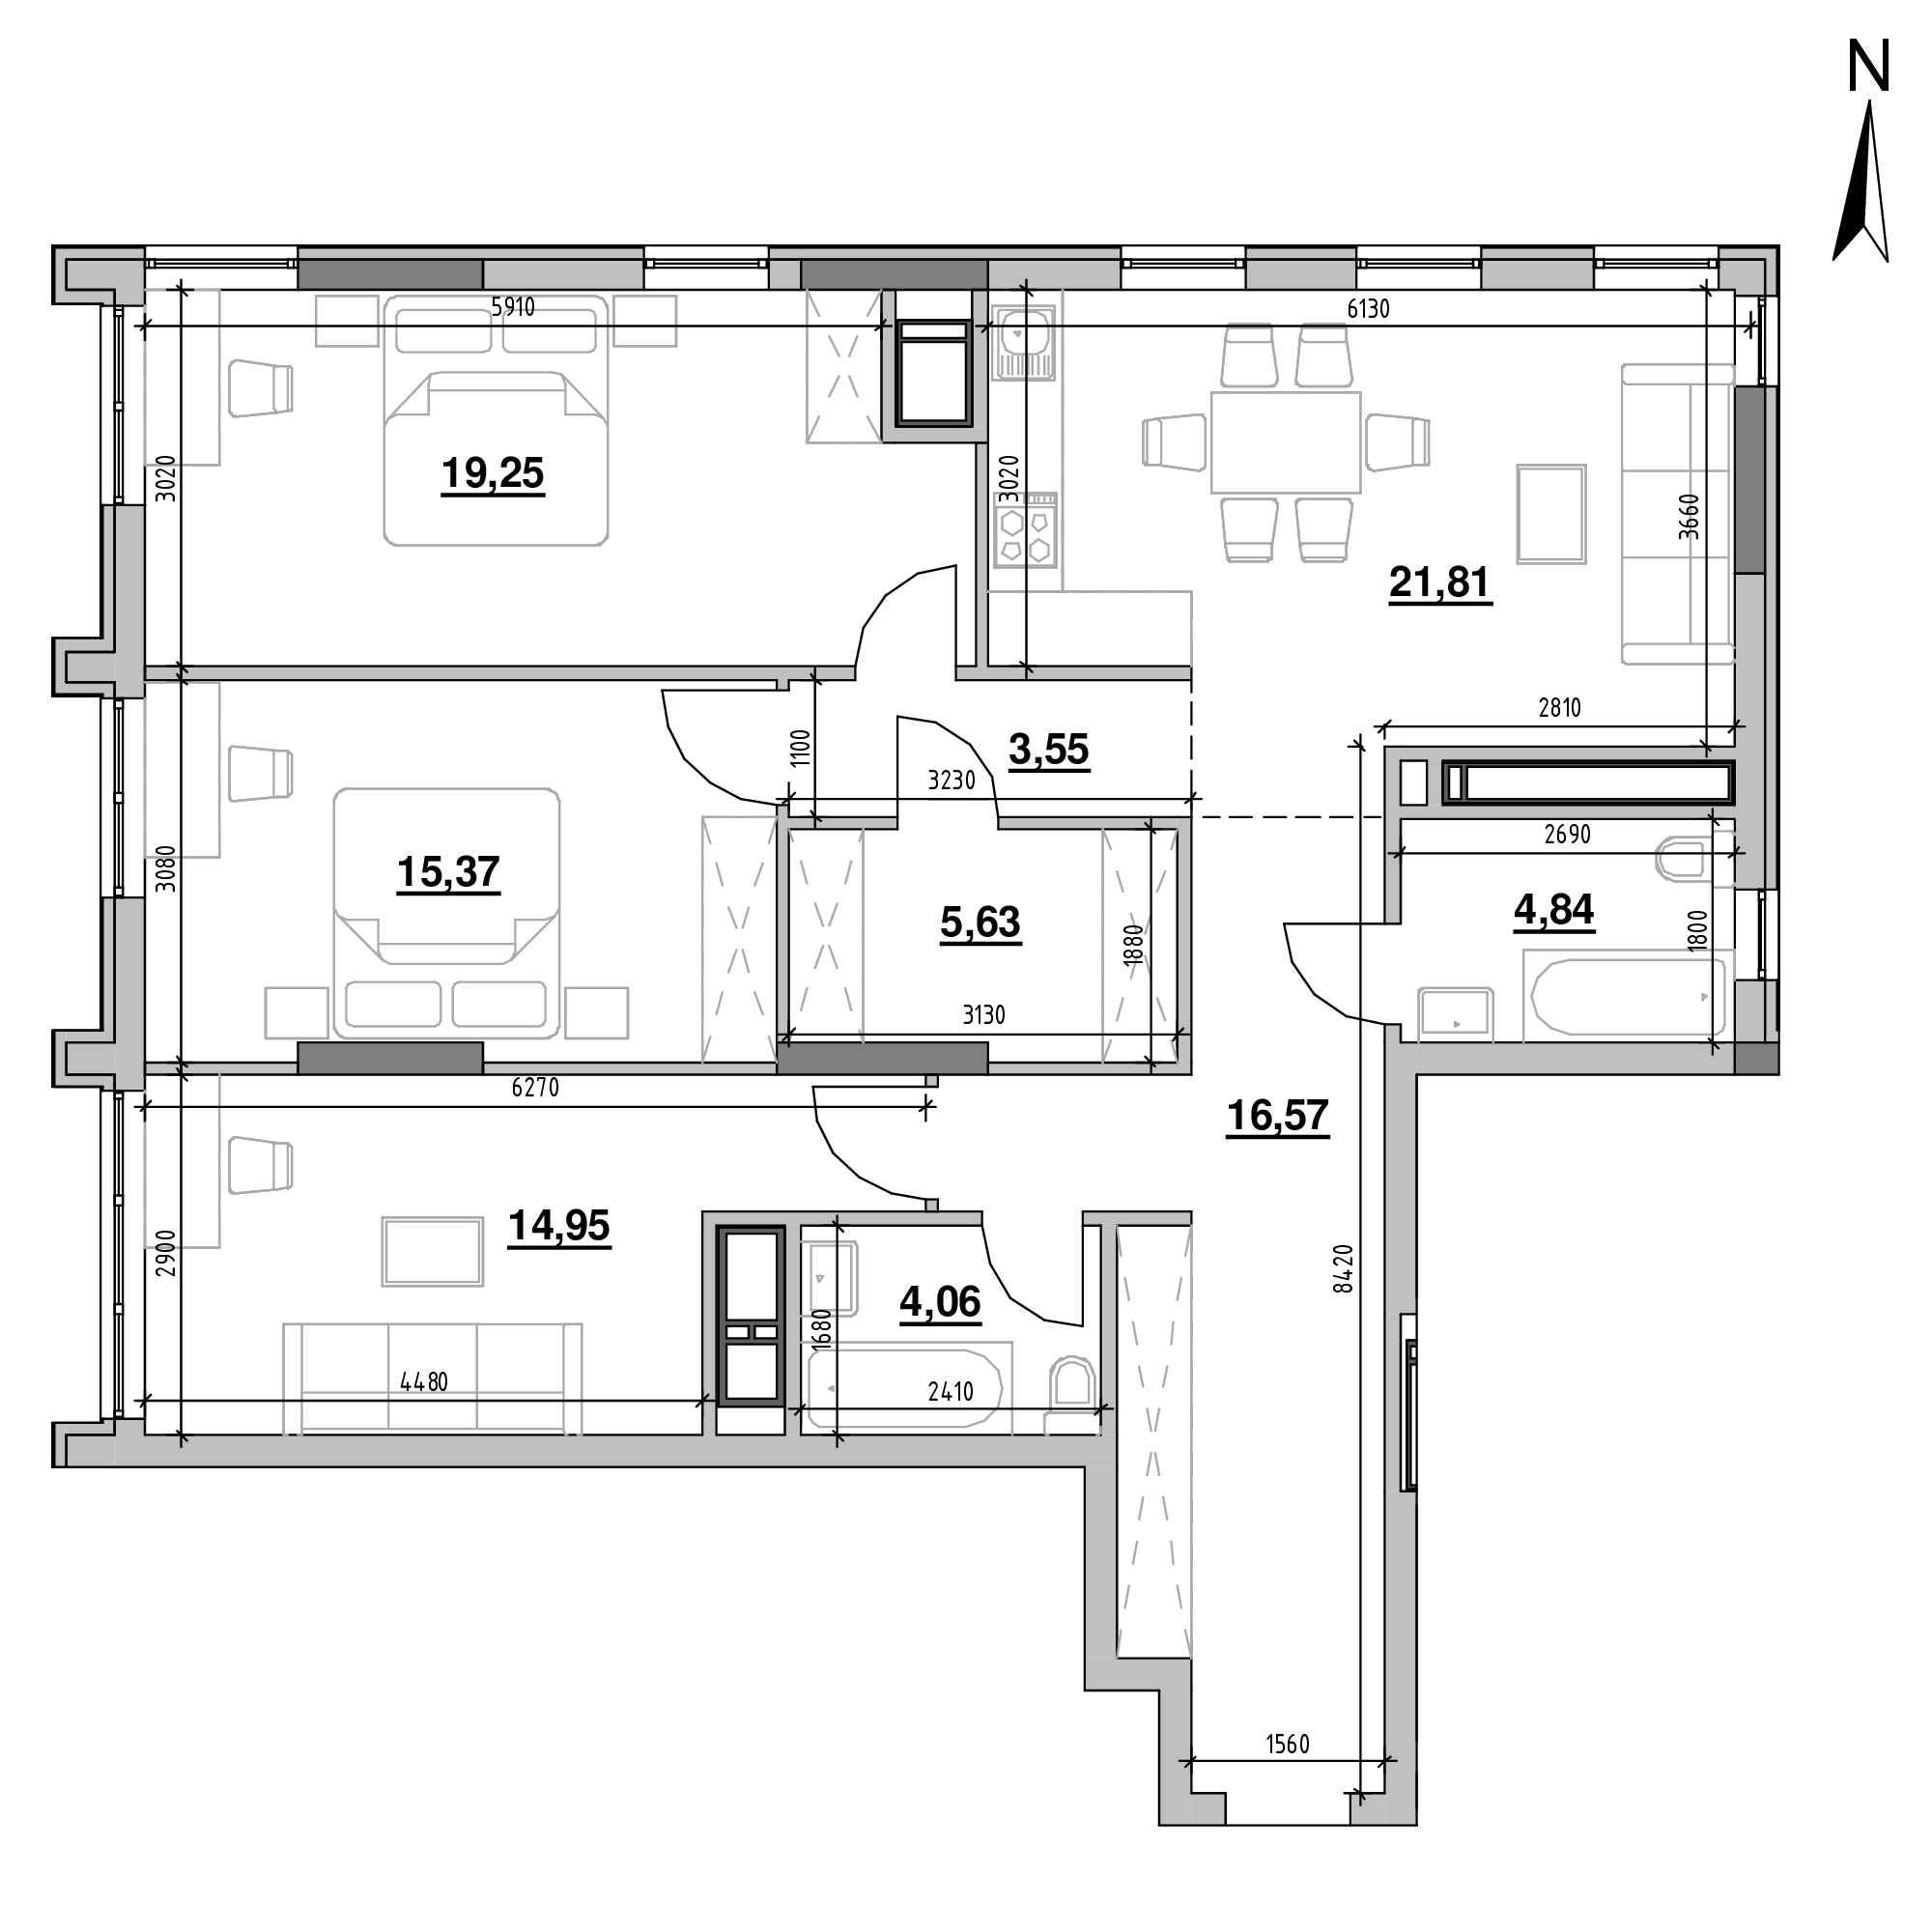 ЖК Nordica Residence: планування 1-кімнатної квартири, №169, 40.97 м<sup>2</sup>